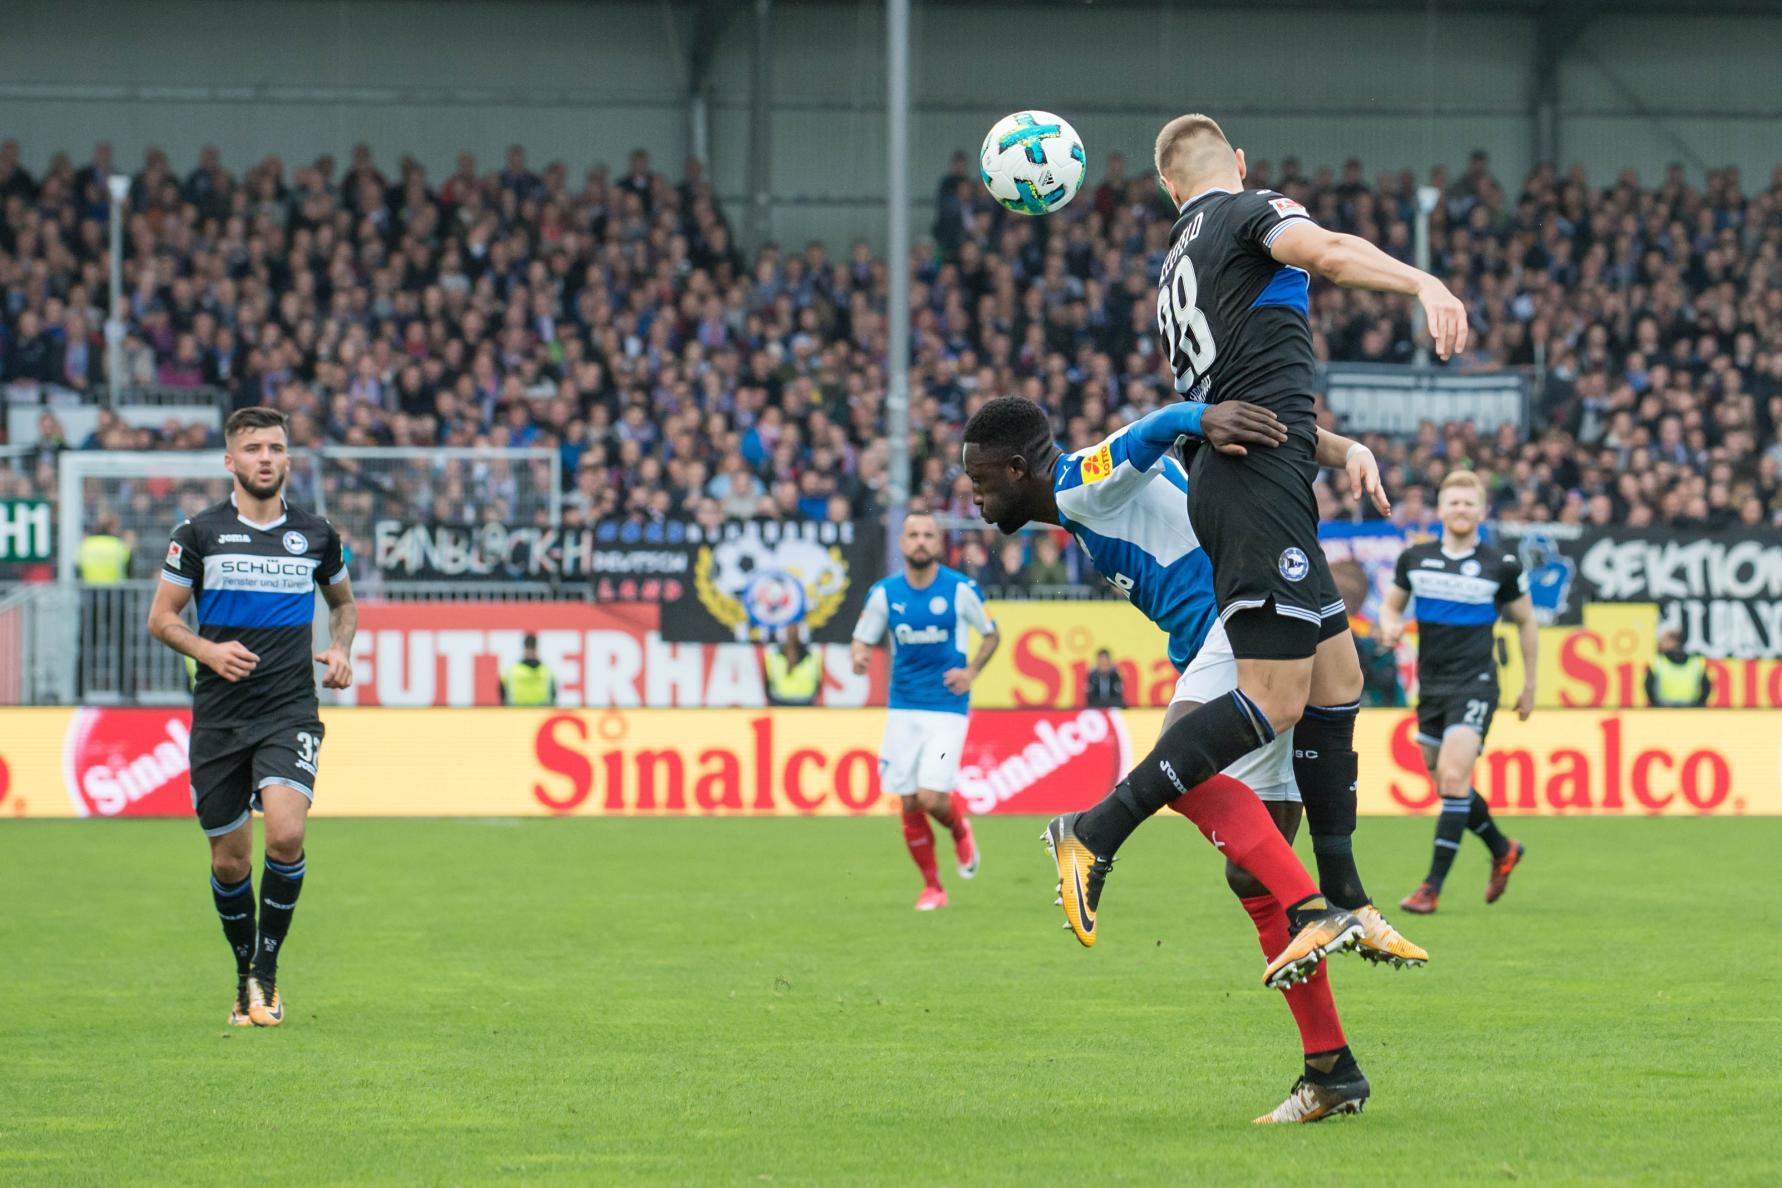 Holstein Kiel Bielefeld 2. Liga